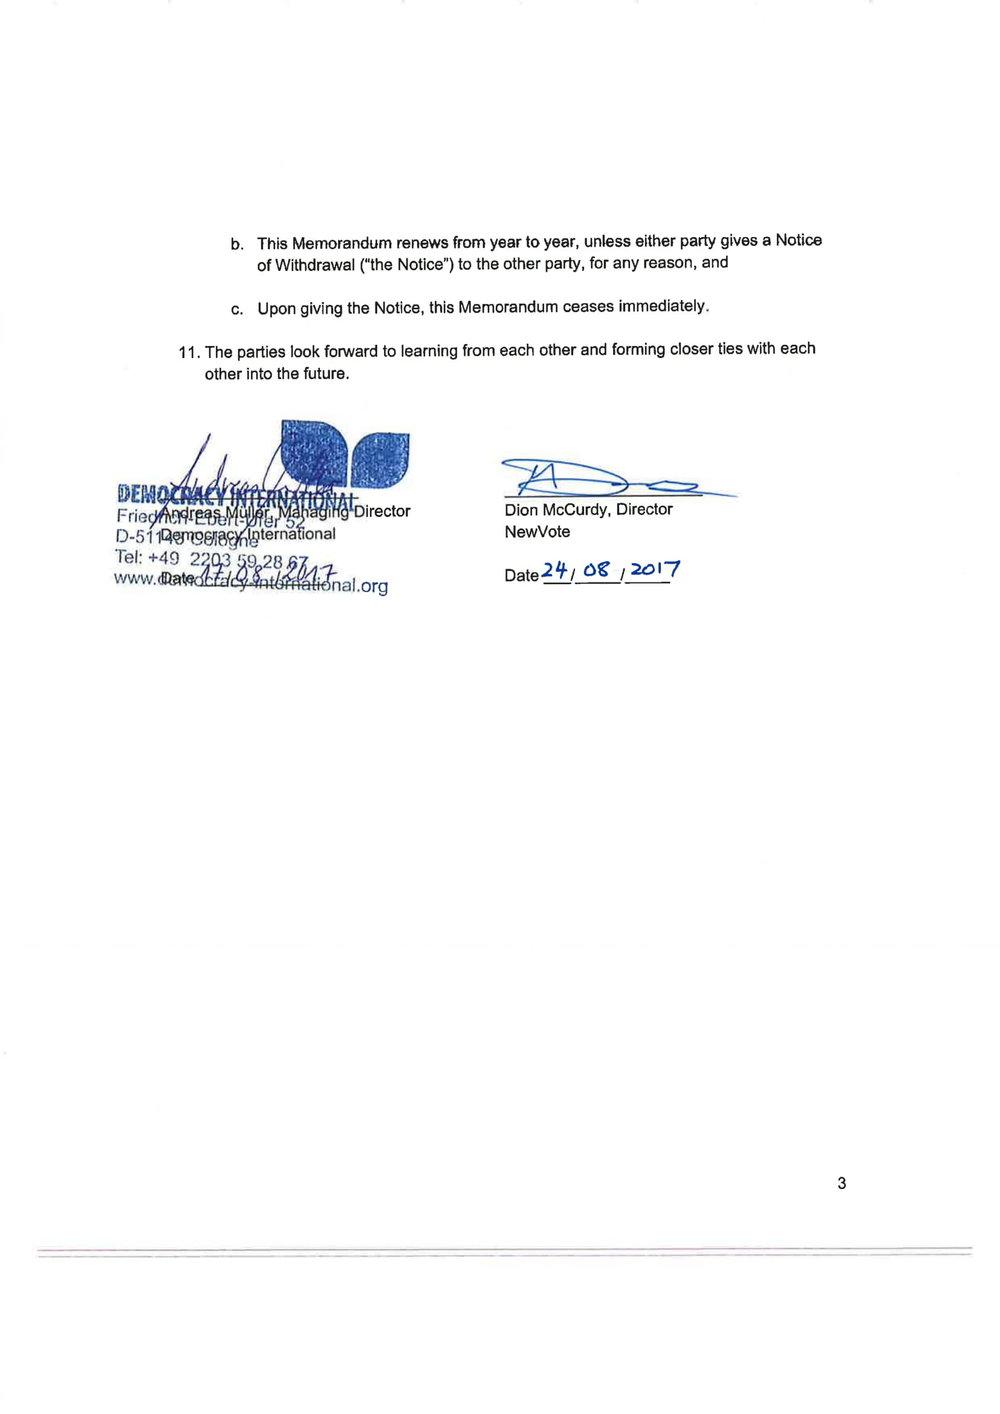 Memorandum of Understanding DemIntl and NewVote-3.jpg